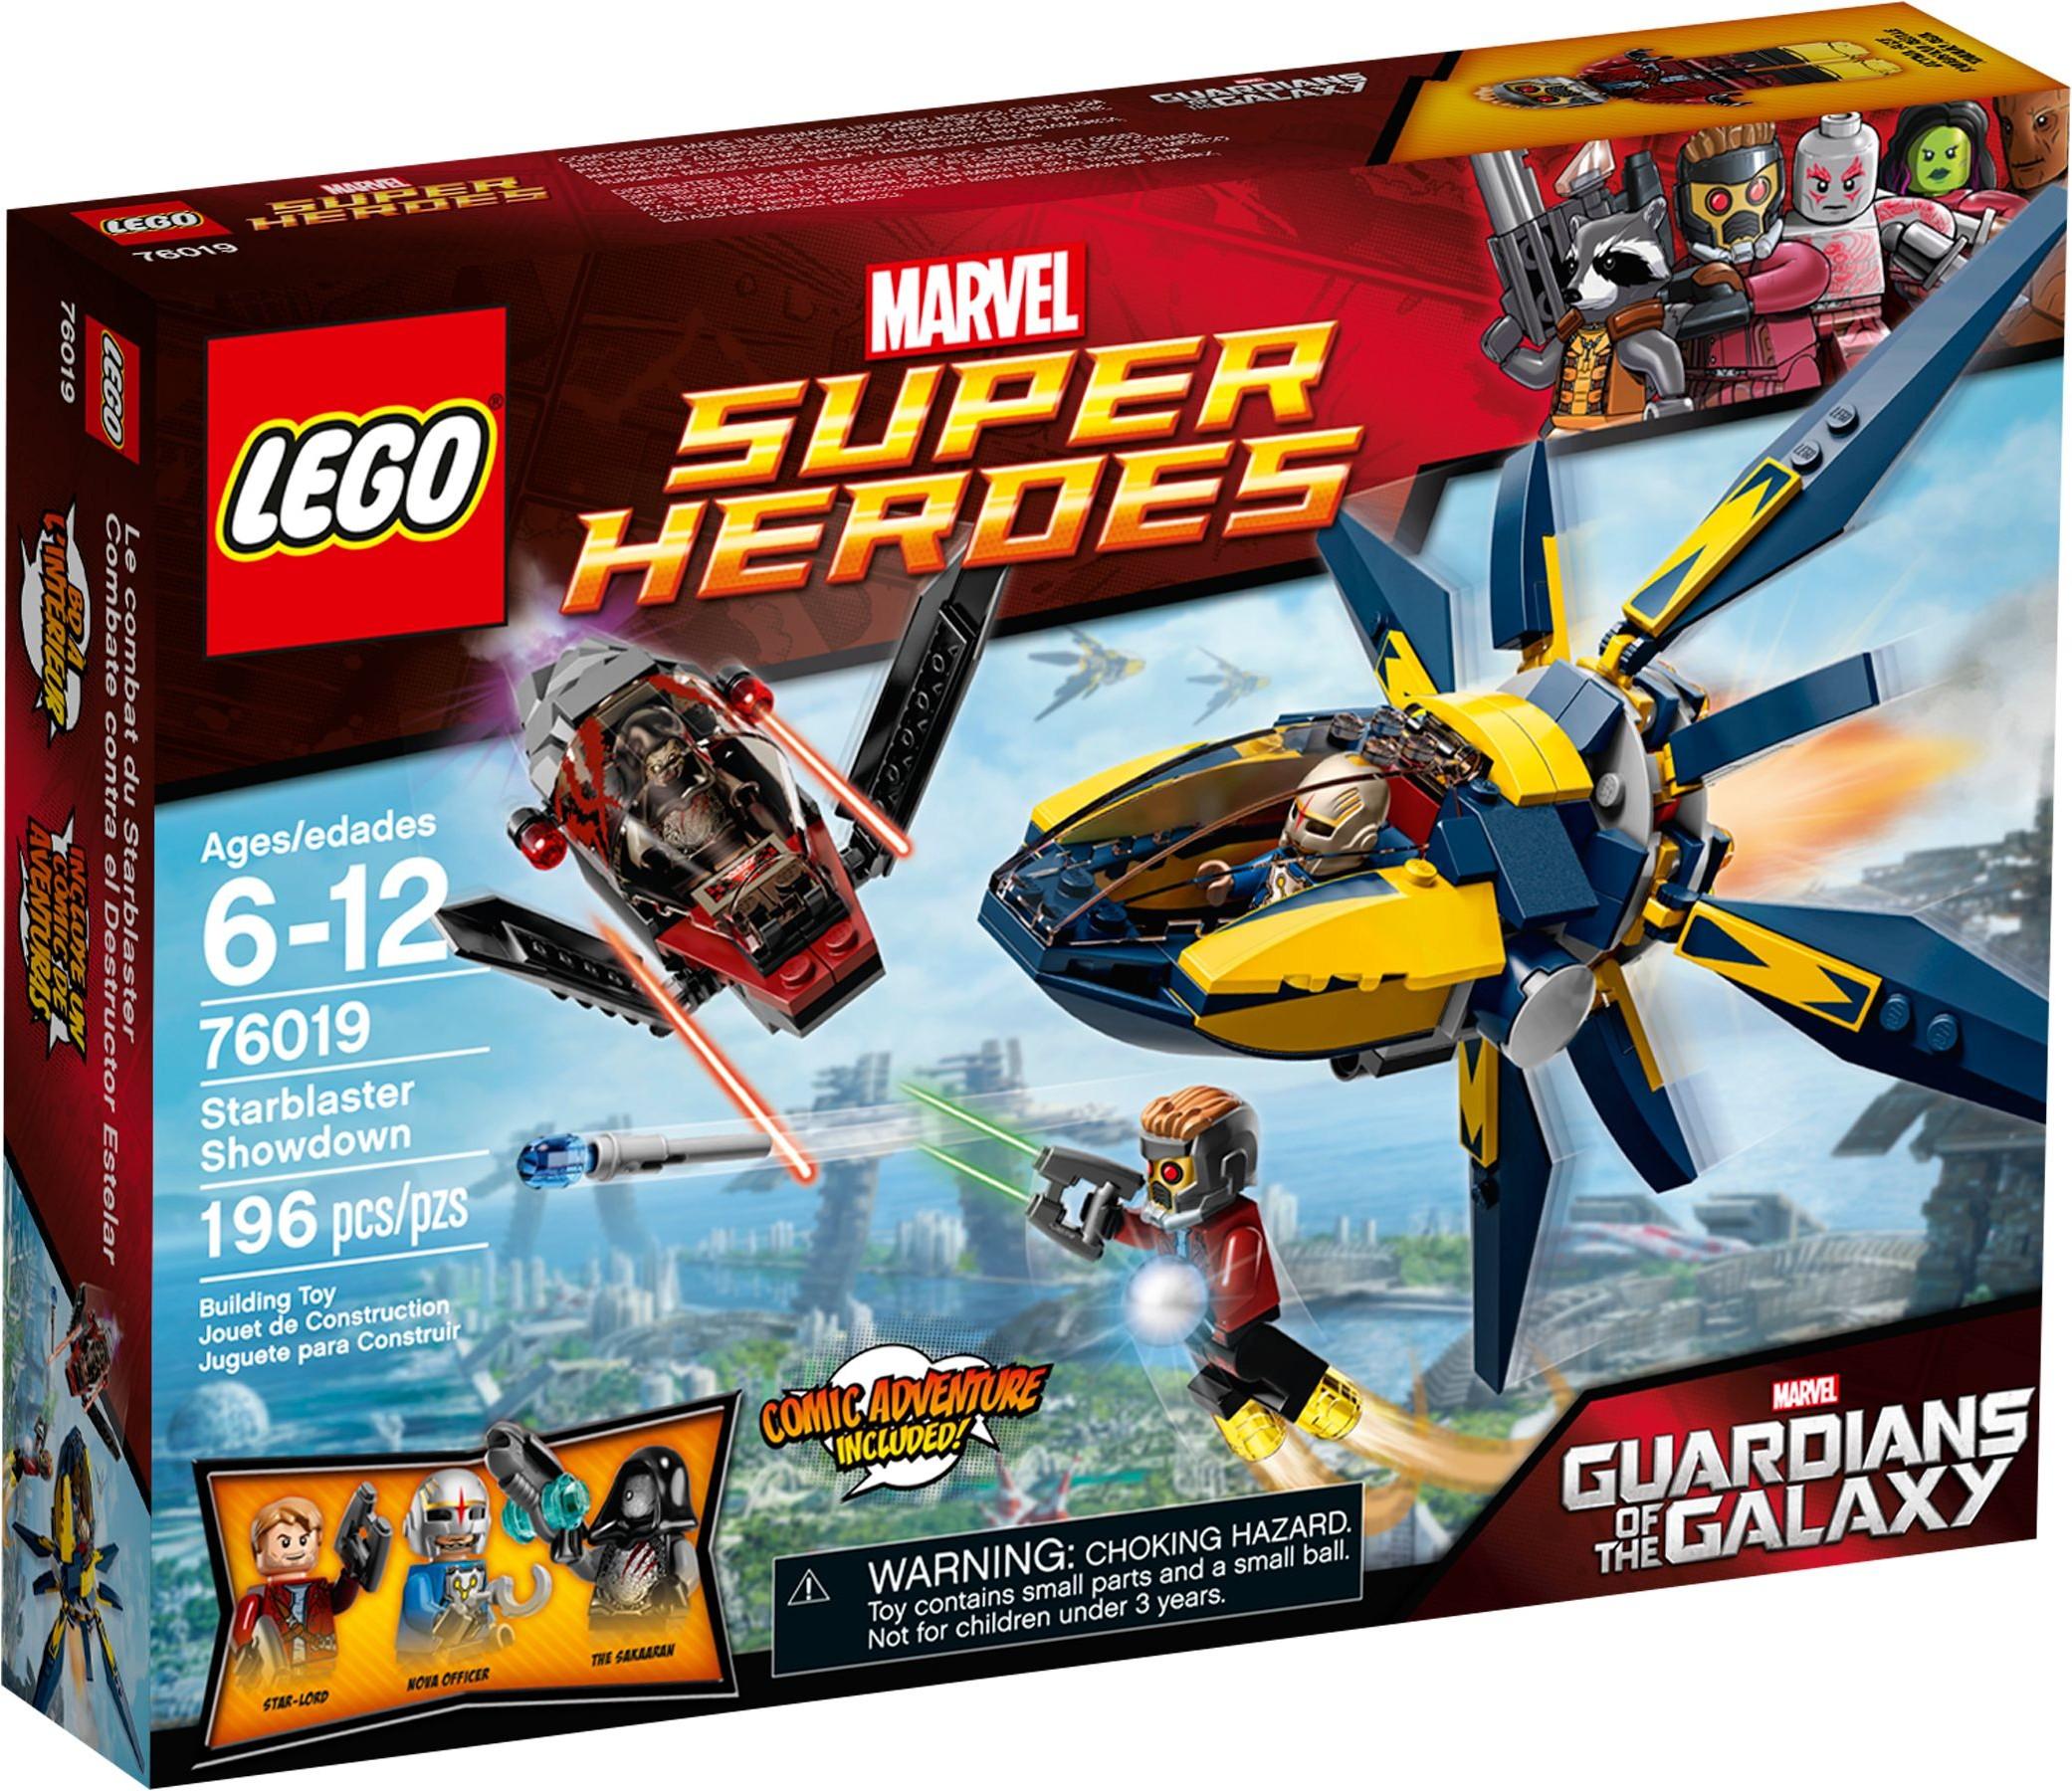 File:LEGO-Guardians-of-the-Galaxy-Starblaster-Showdown-76019-Box-e1396642421923.jpg